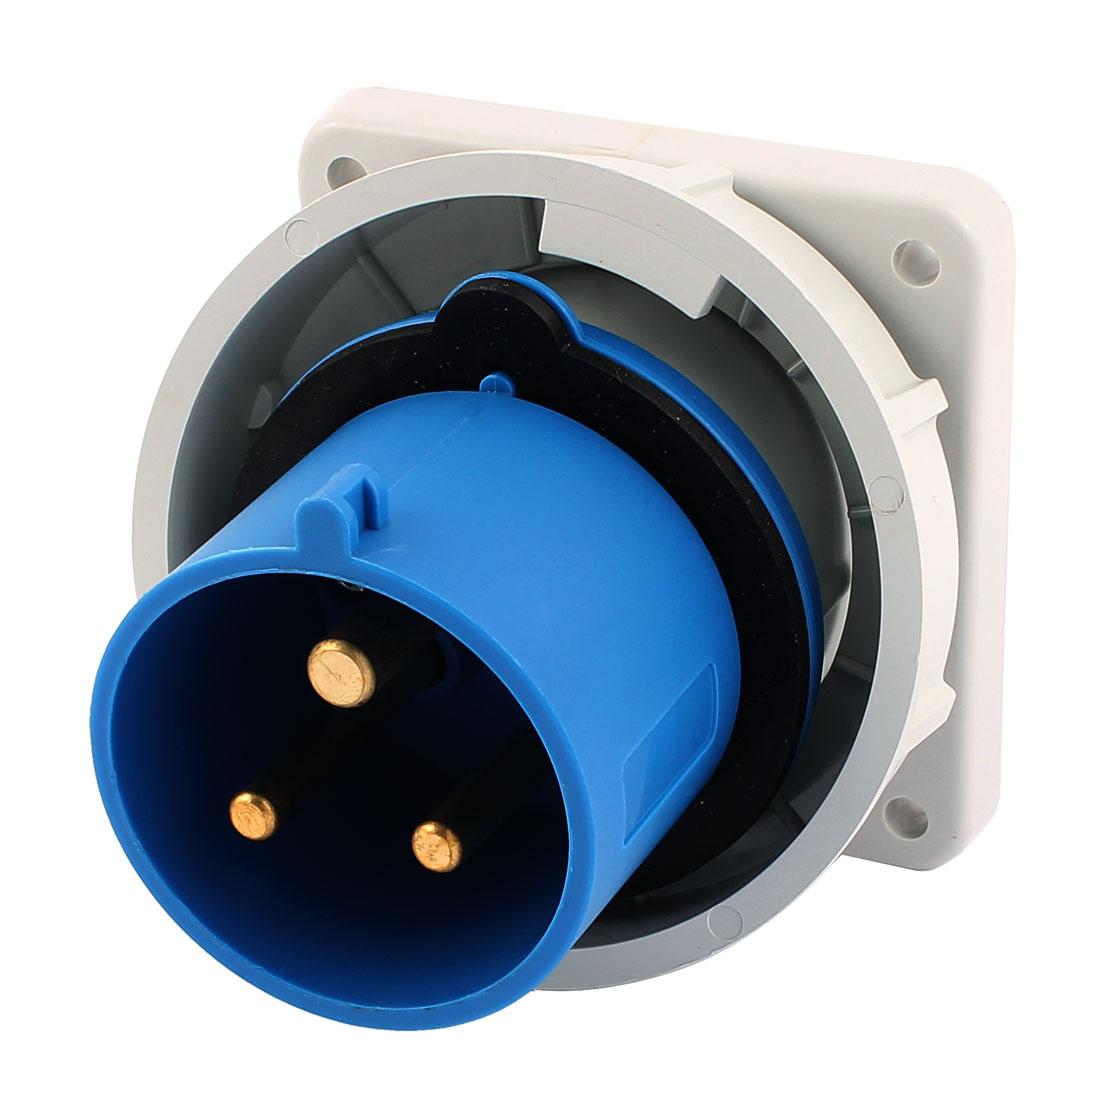 AC 200V-250V 32A IP67 2P+E 3 Terminal Male Industrial Panel Mounting Plug